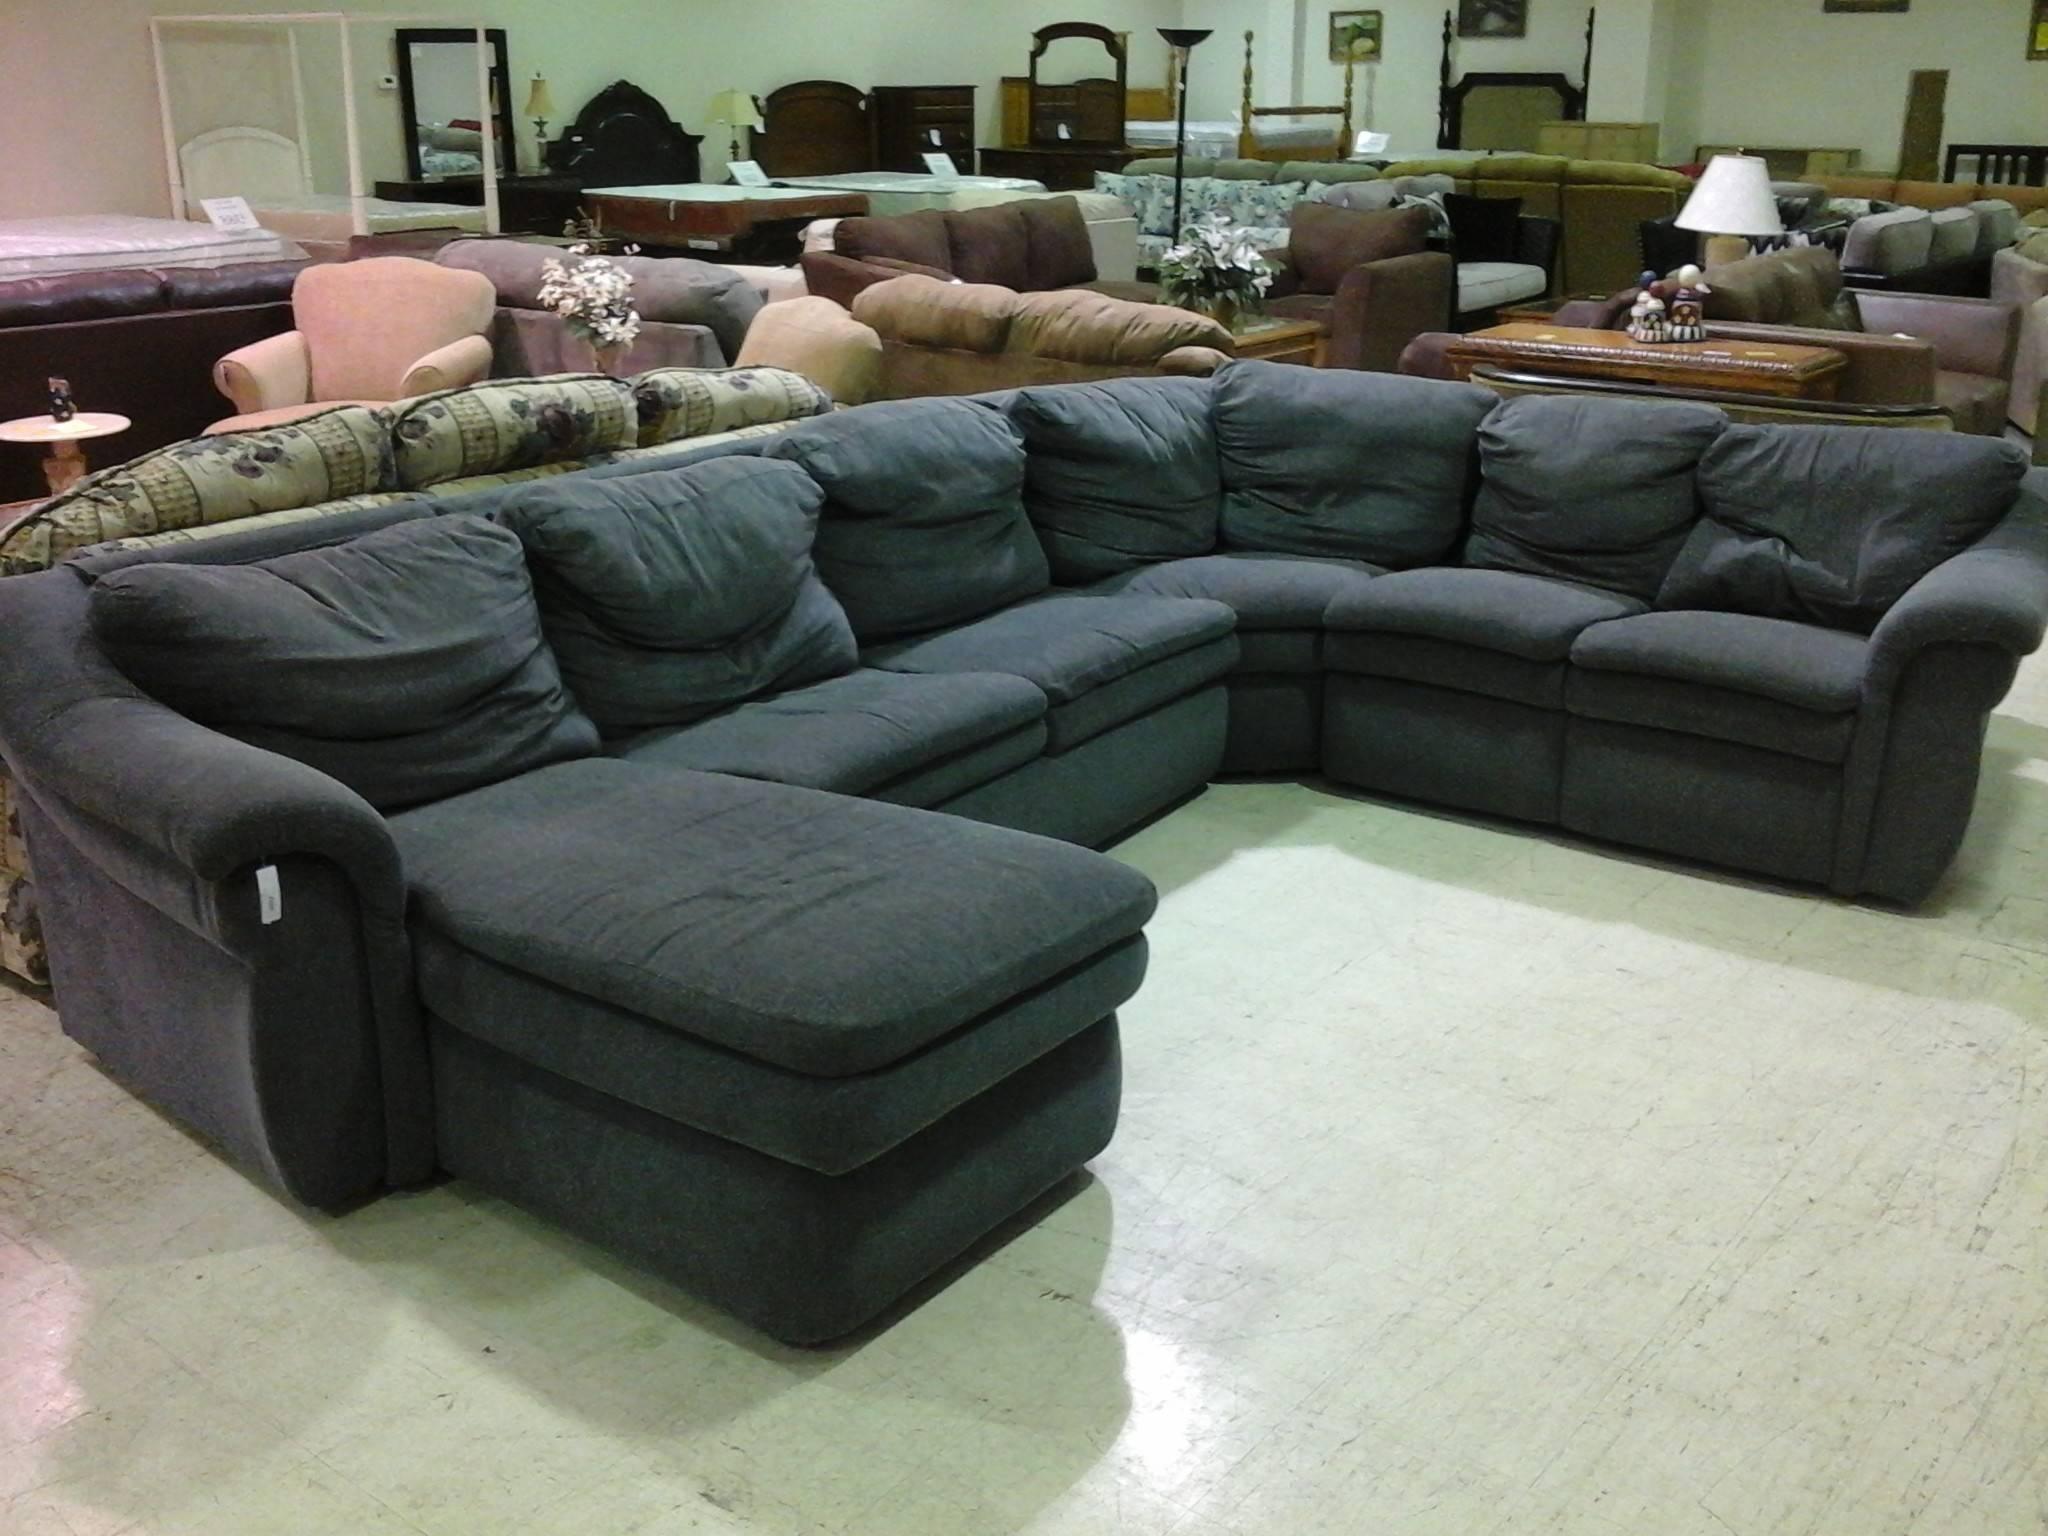 Furniture Home : Sleeper Sofa Big Lots Lp Designs Regarding New regarding Big Lots Sofa (Image 8 of 30)